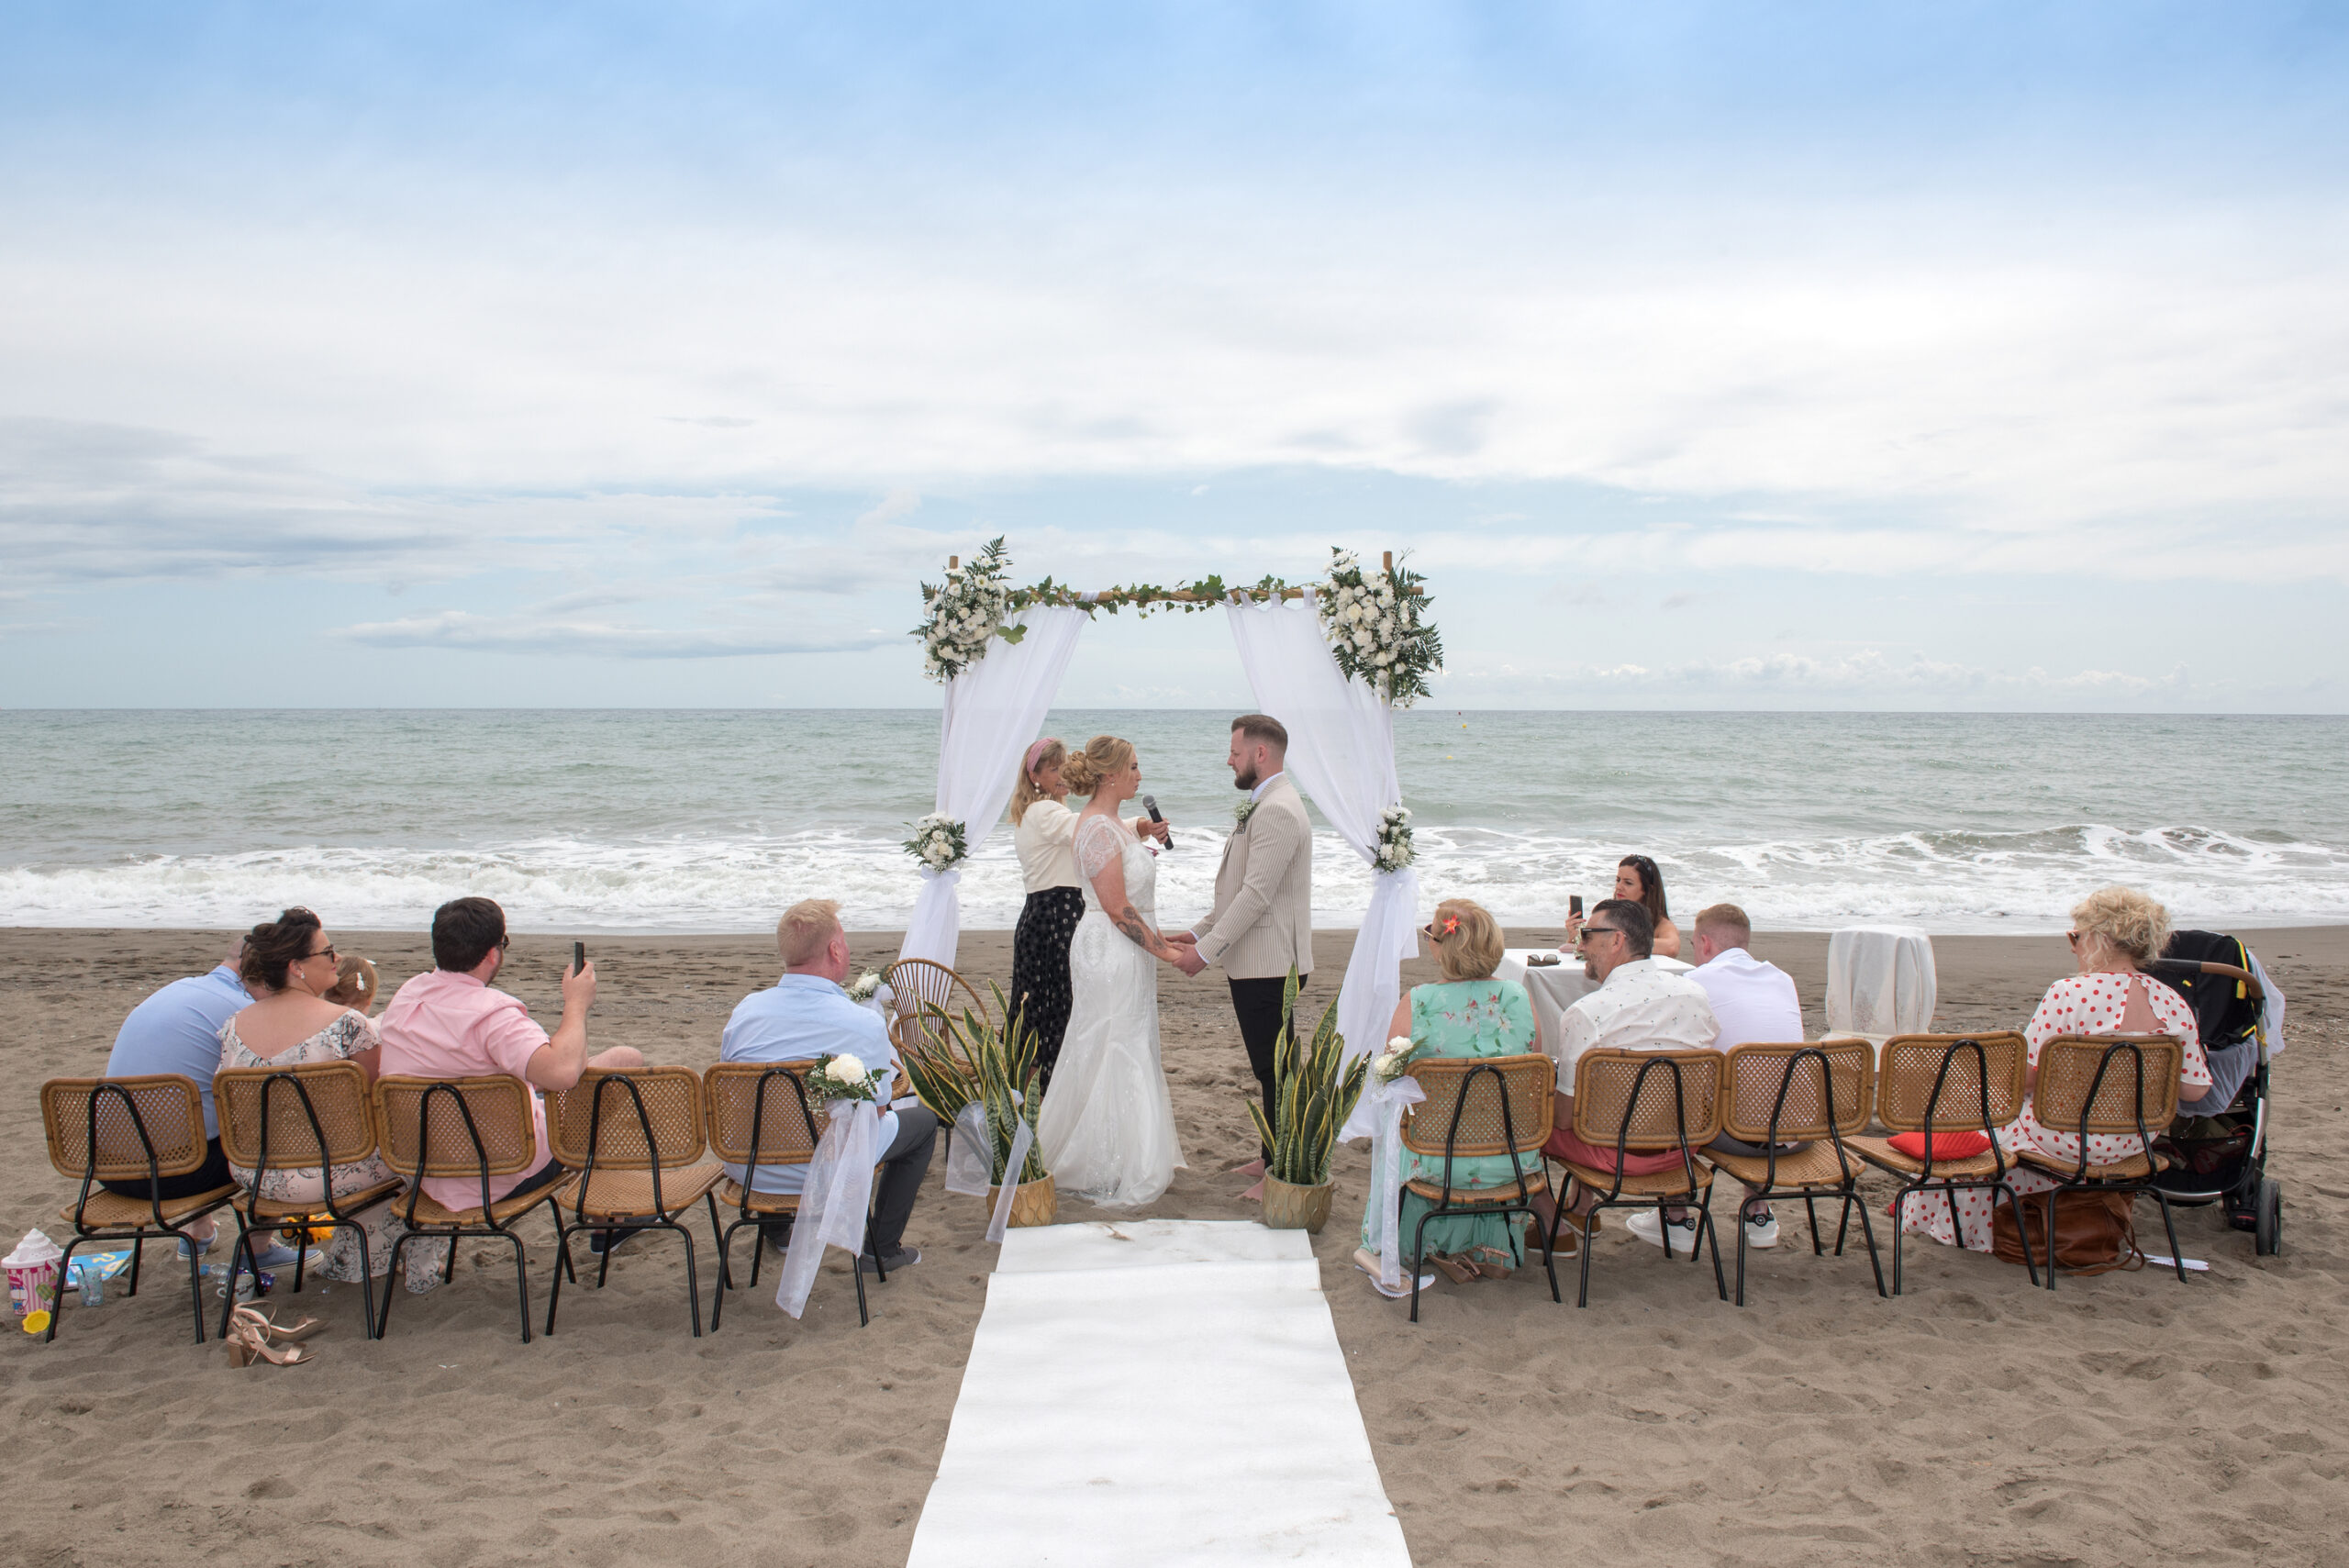 tiny beach wedding in Spain